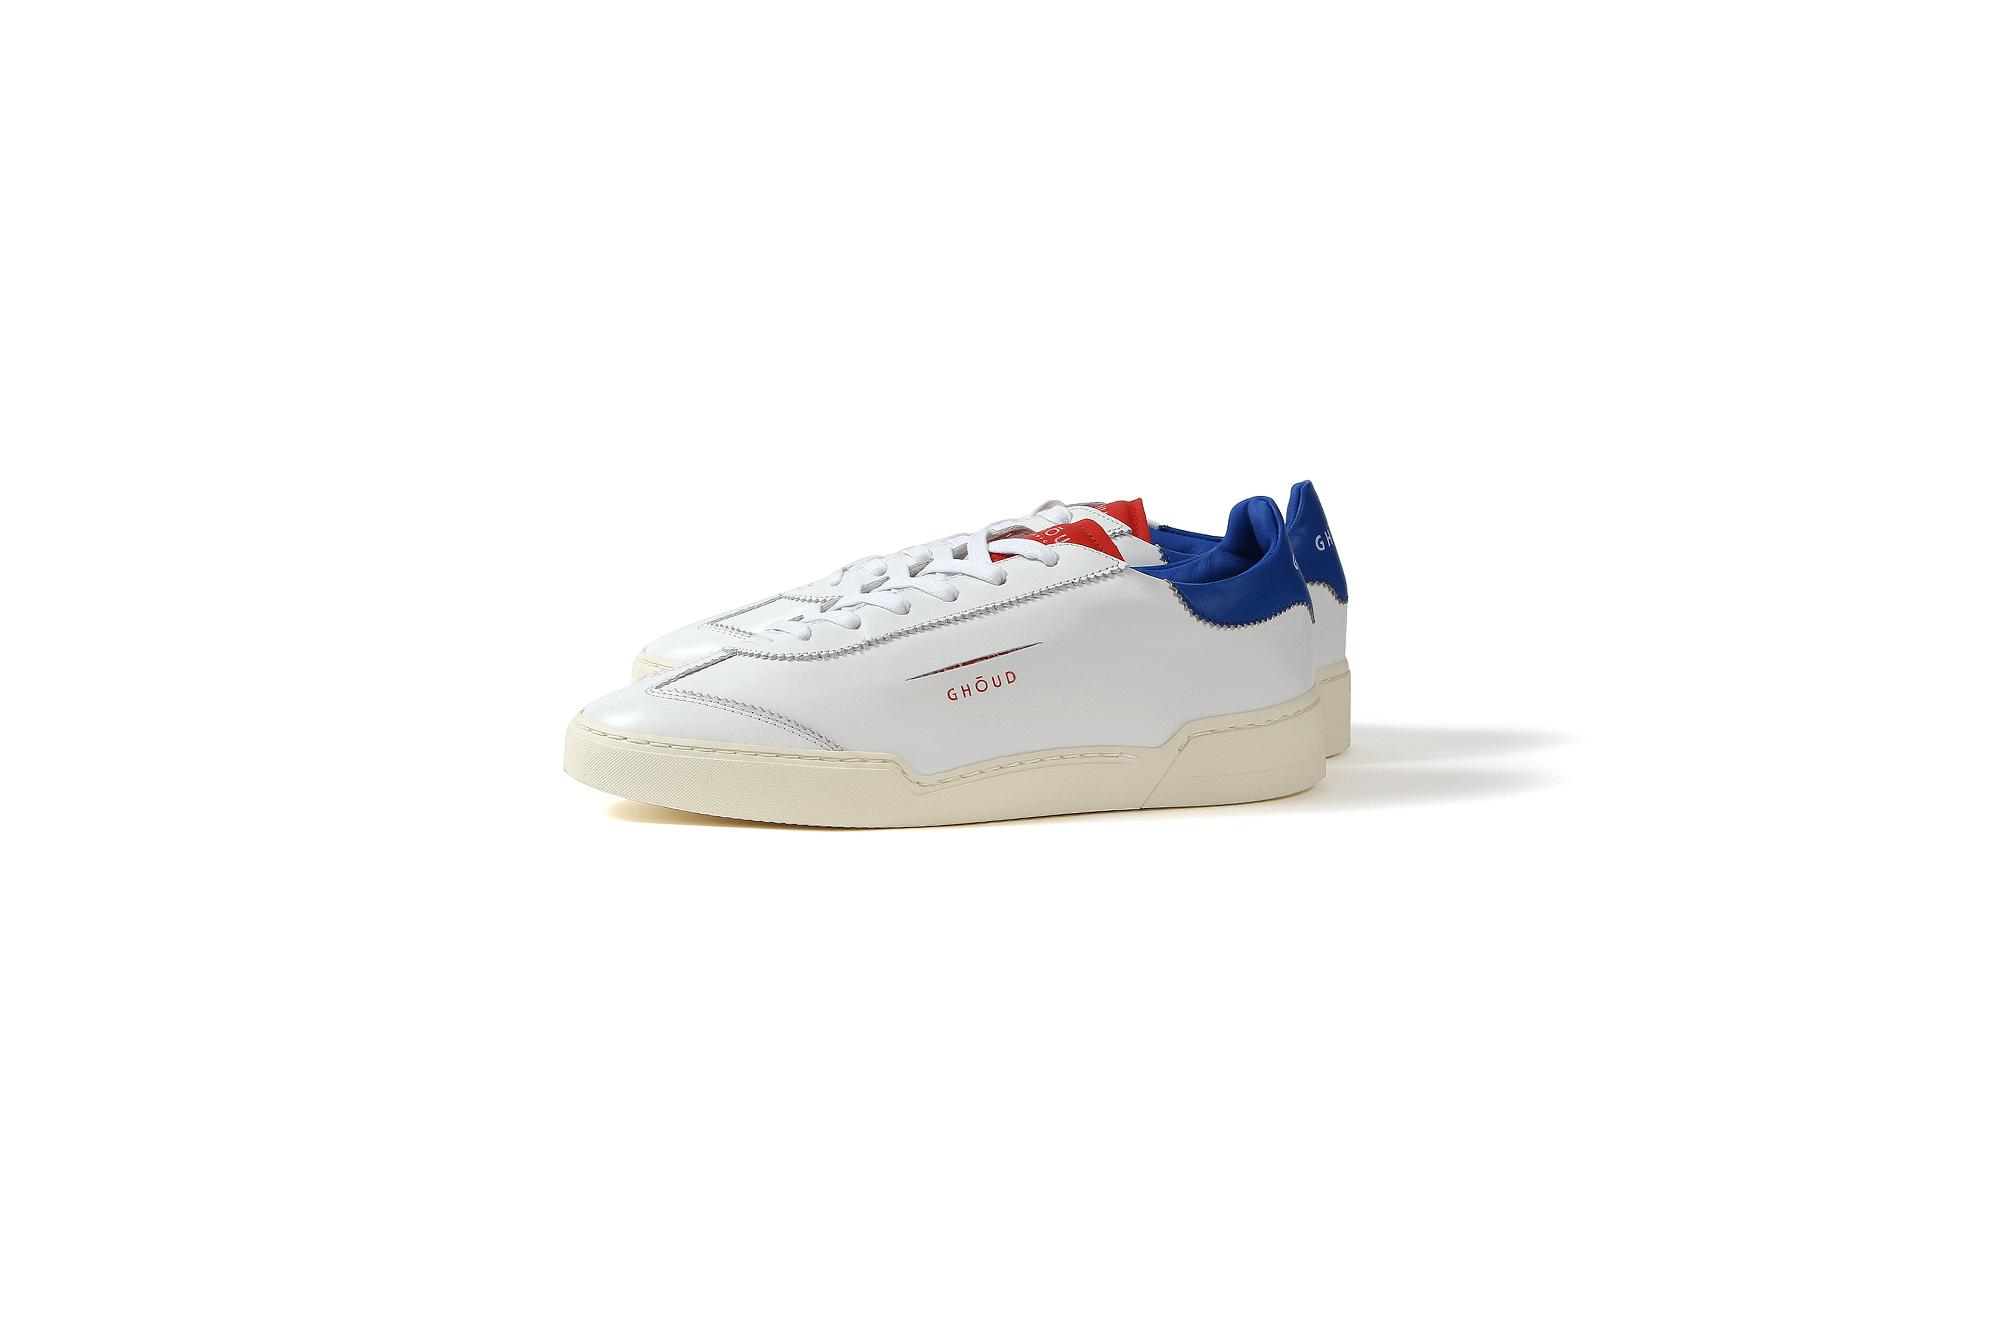 GHOUD(ゴード) LOB01 LOW MAN レザースニーカー WHITE/BLUE/RED(ホワイト/ブルー/レッド) 2020 春夏新作 愛知 名古屋 altoediritto アルトエデリット 白スニーカー